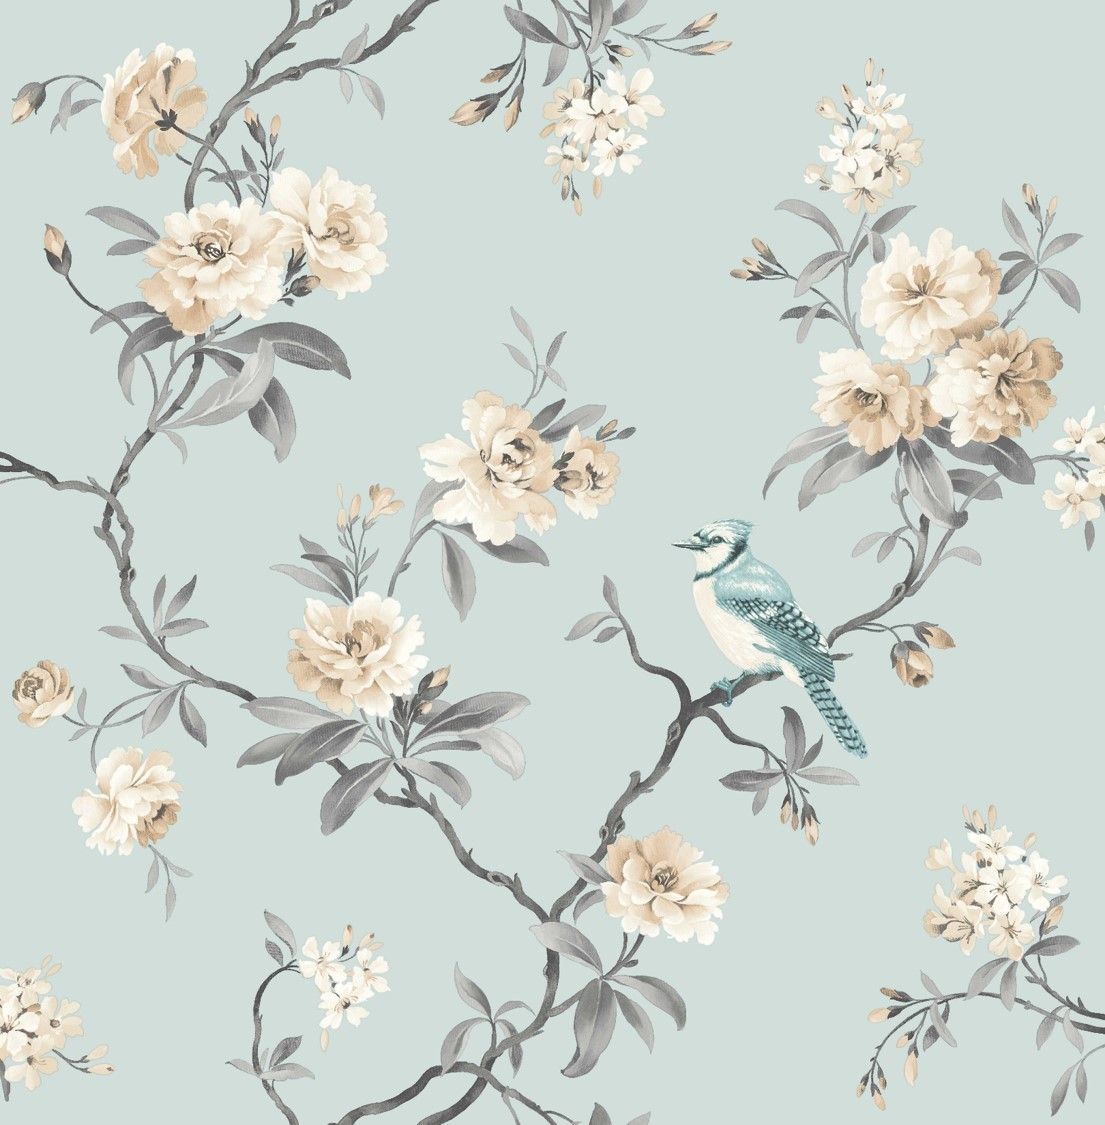 49] Cheapest Wallpaper Prices on WallpaperSafari 1105x1125